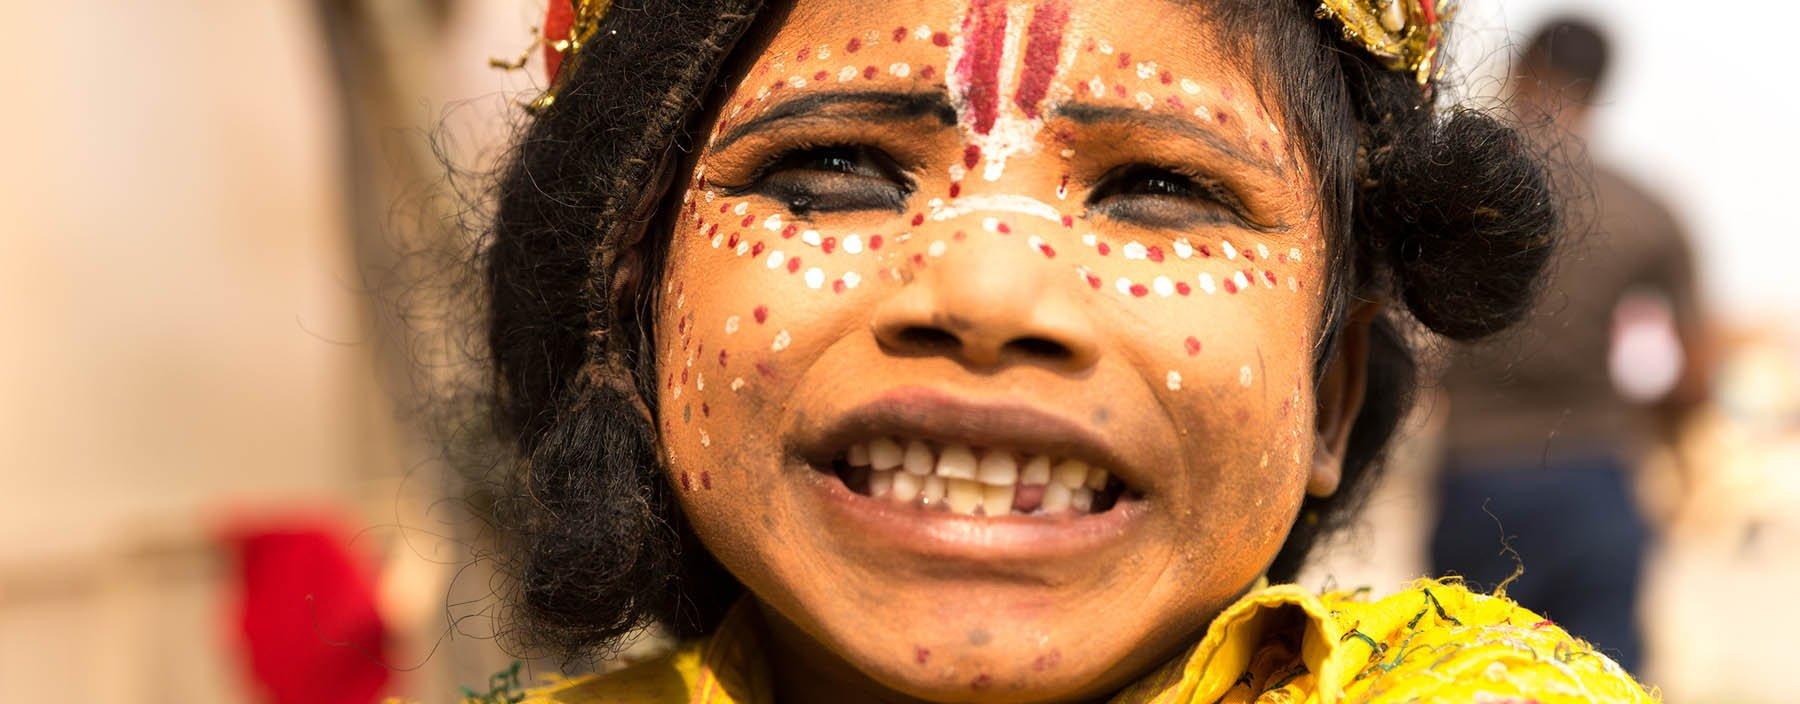 in, varanasi, children painted near raj ghat.jpg